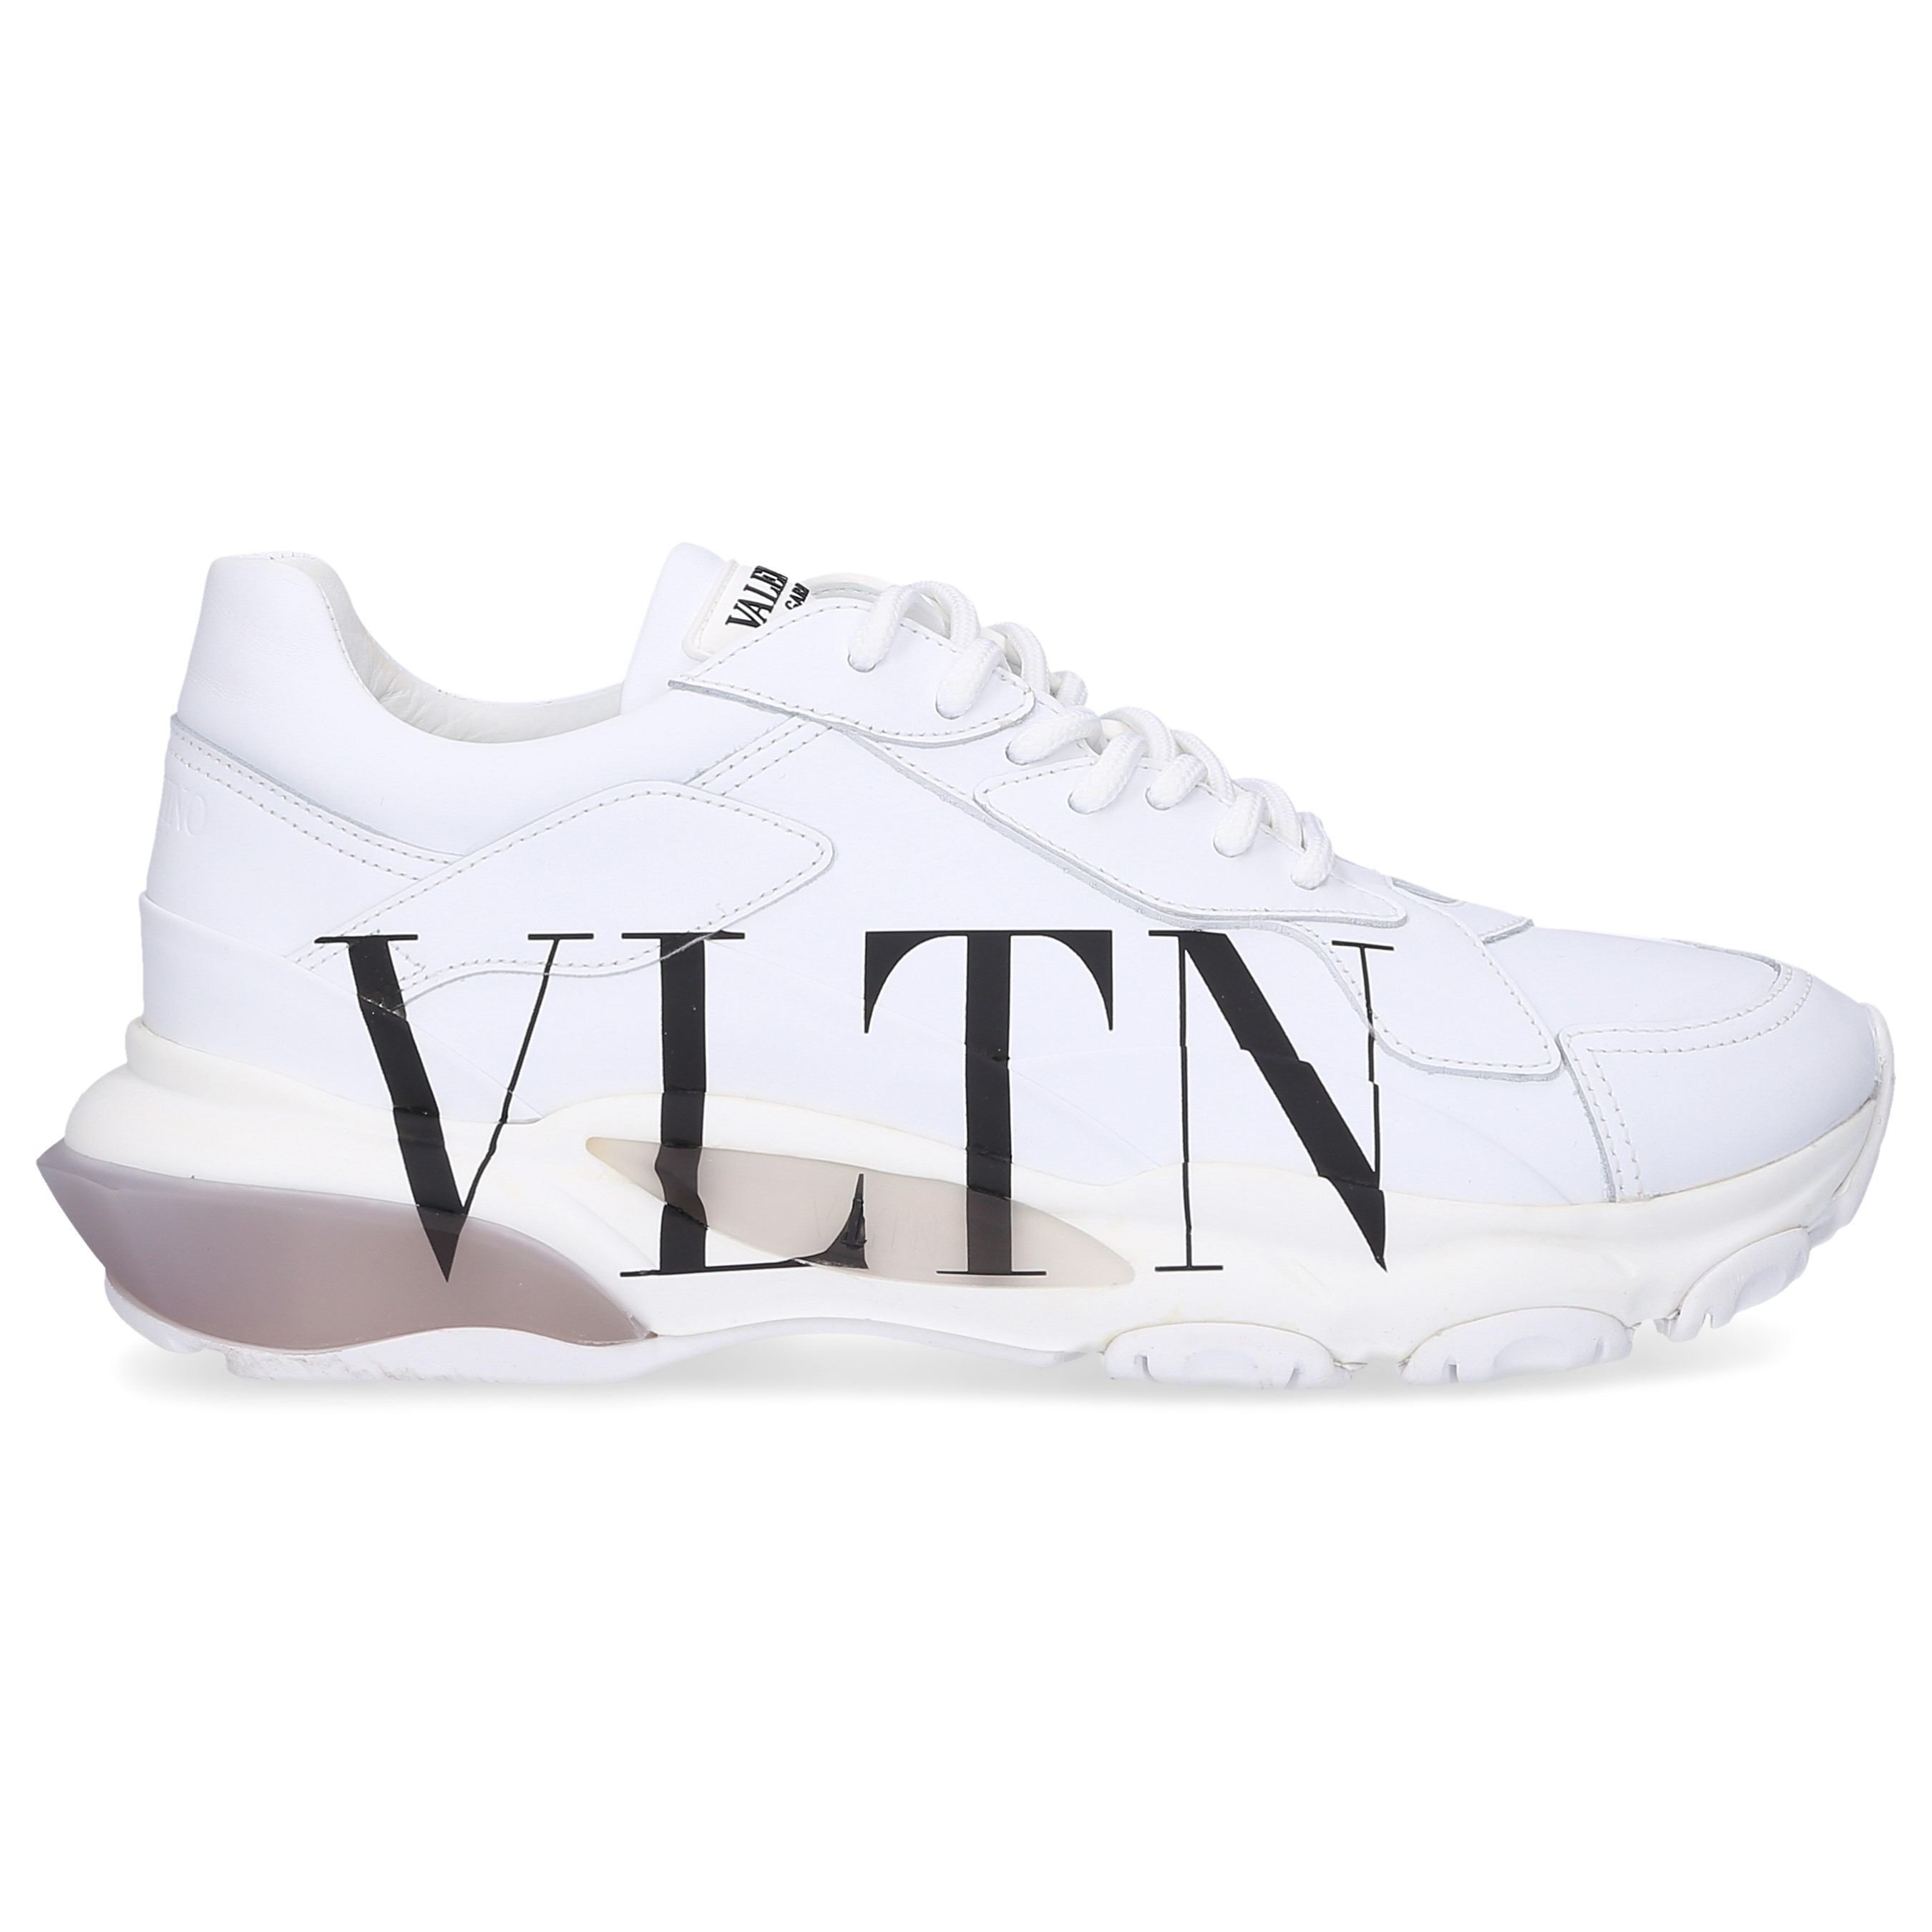 Valentino Sneaker low BOUNCE Nappaleder Textil Logo weiß